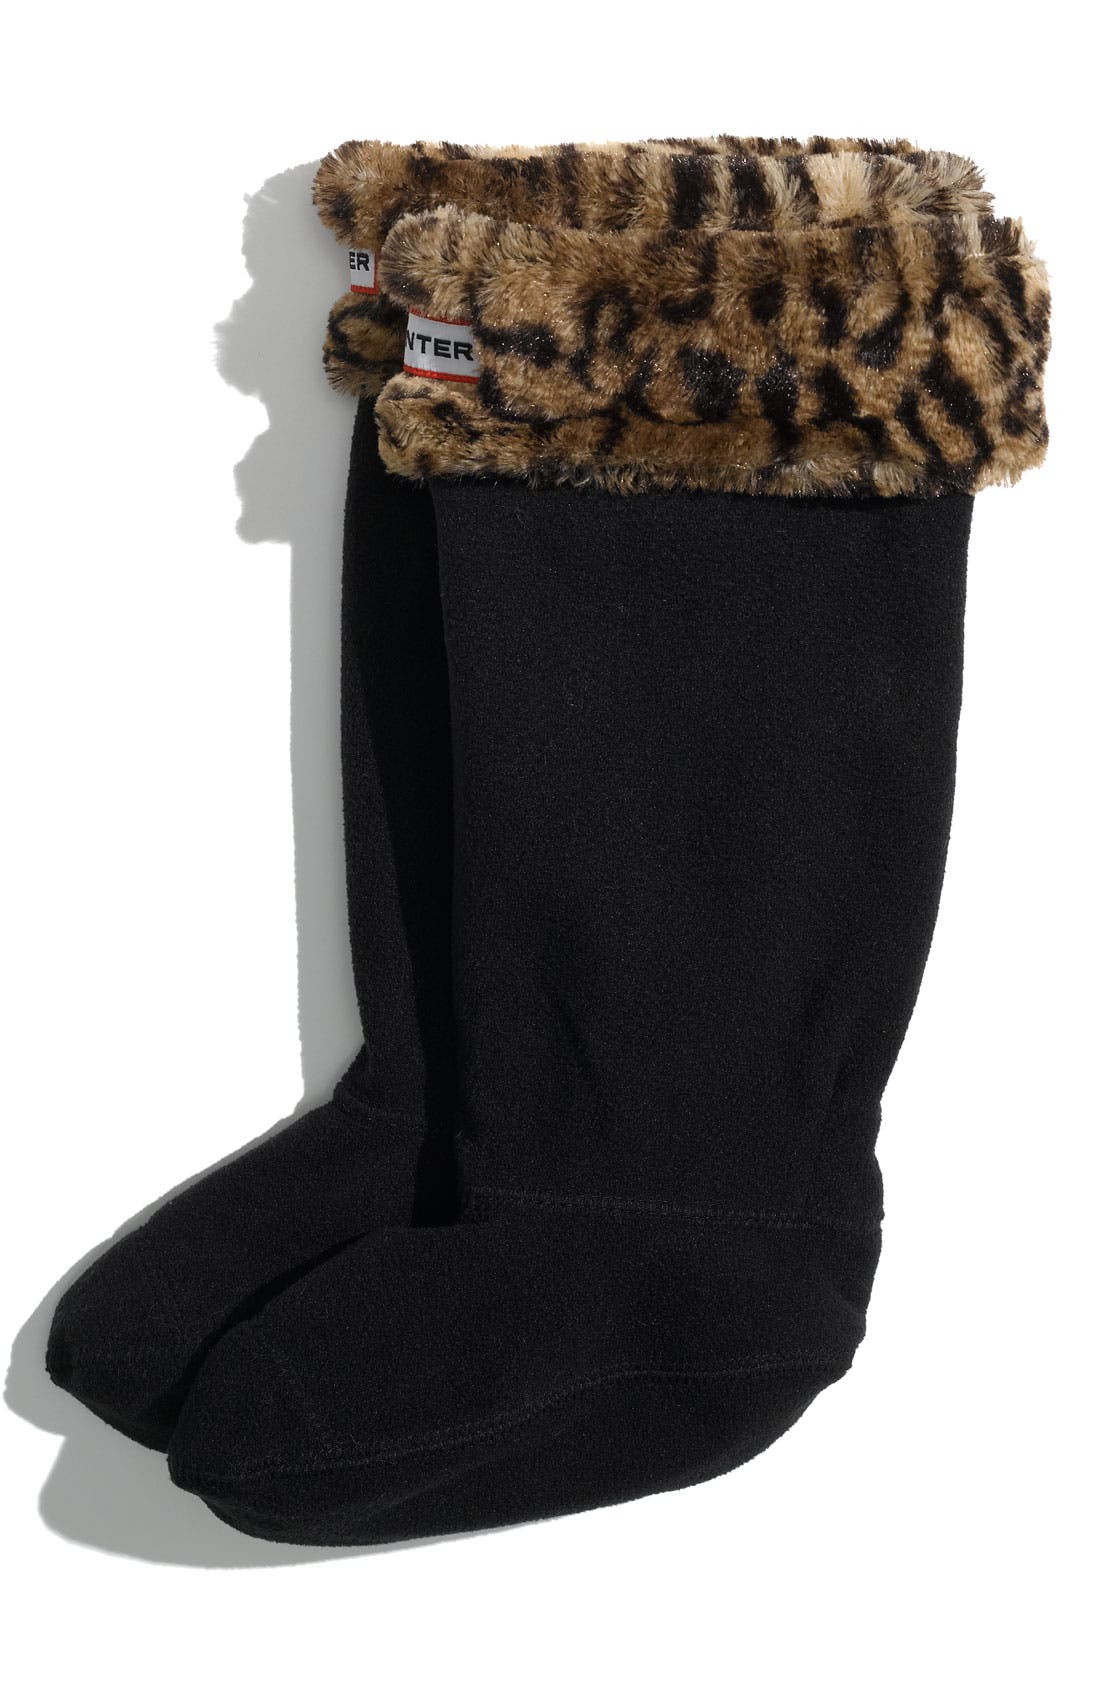 Main Image - Hunter Patterned Fleece Welly Socks (Toddler, Little Girls & Big Girls)